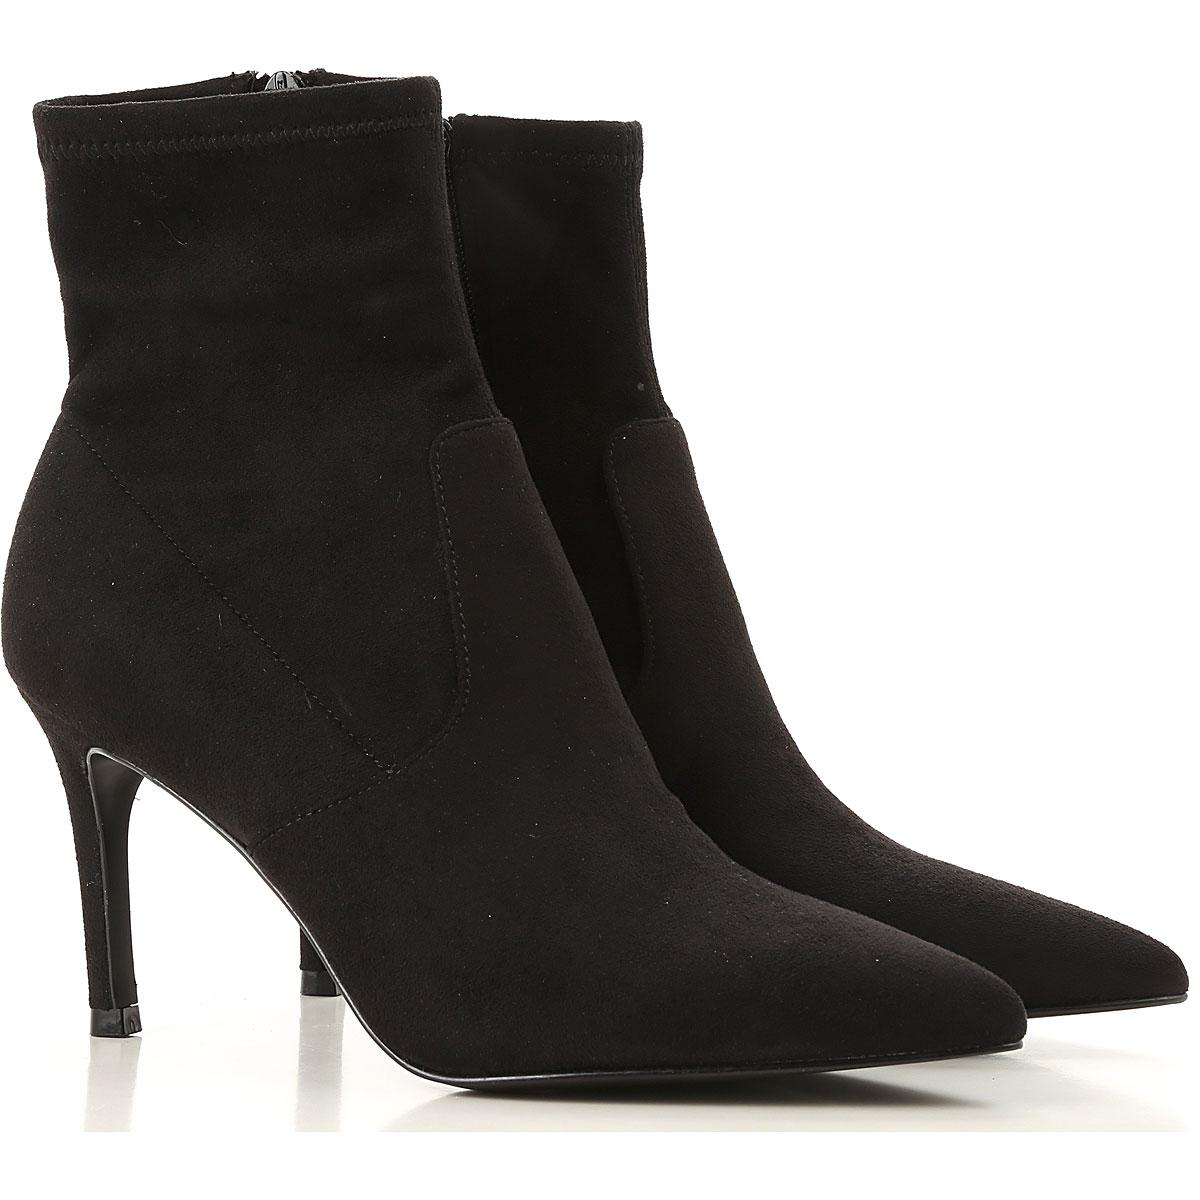 94d43a812dc Womens Shoes Steve Madden, Style code: lava-black-